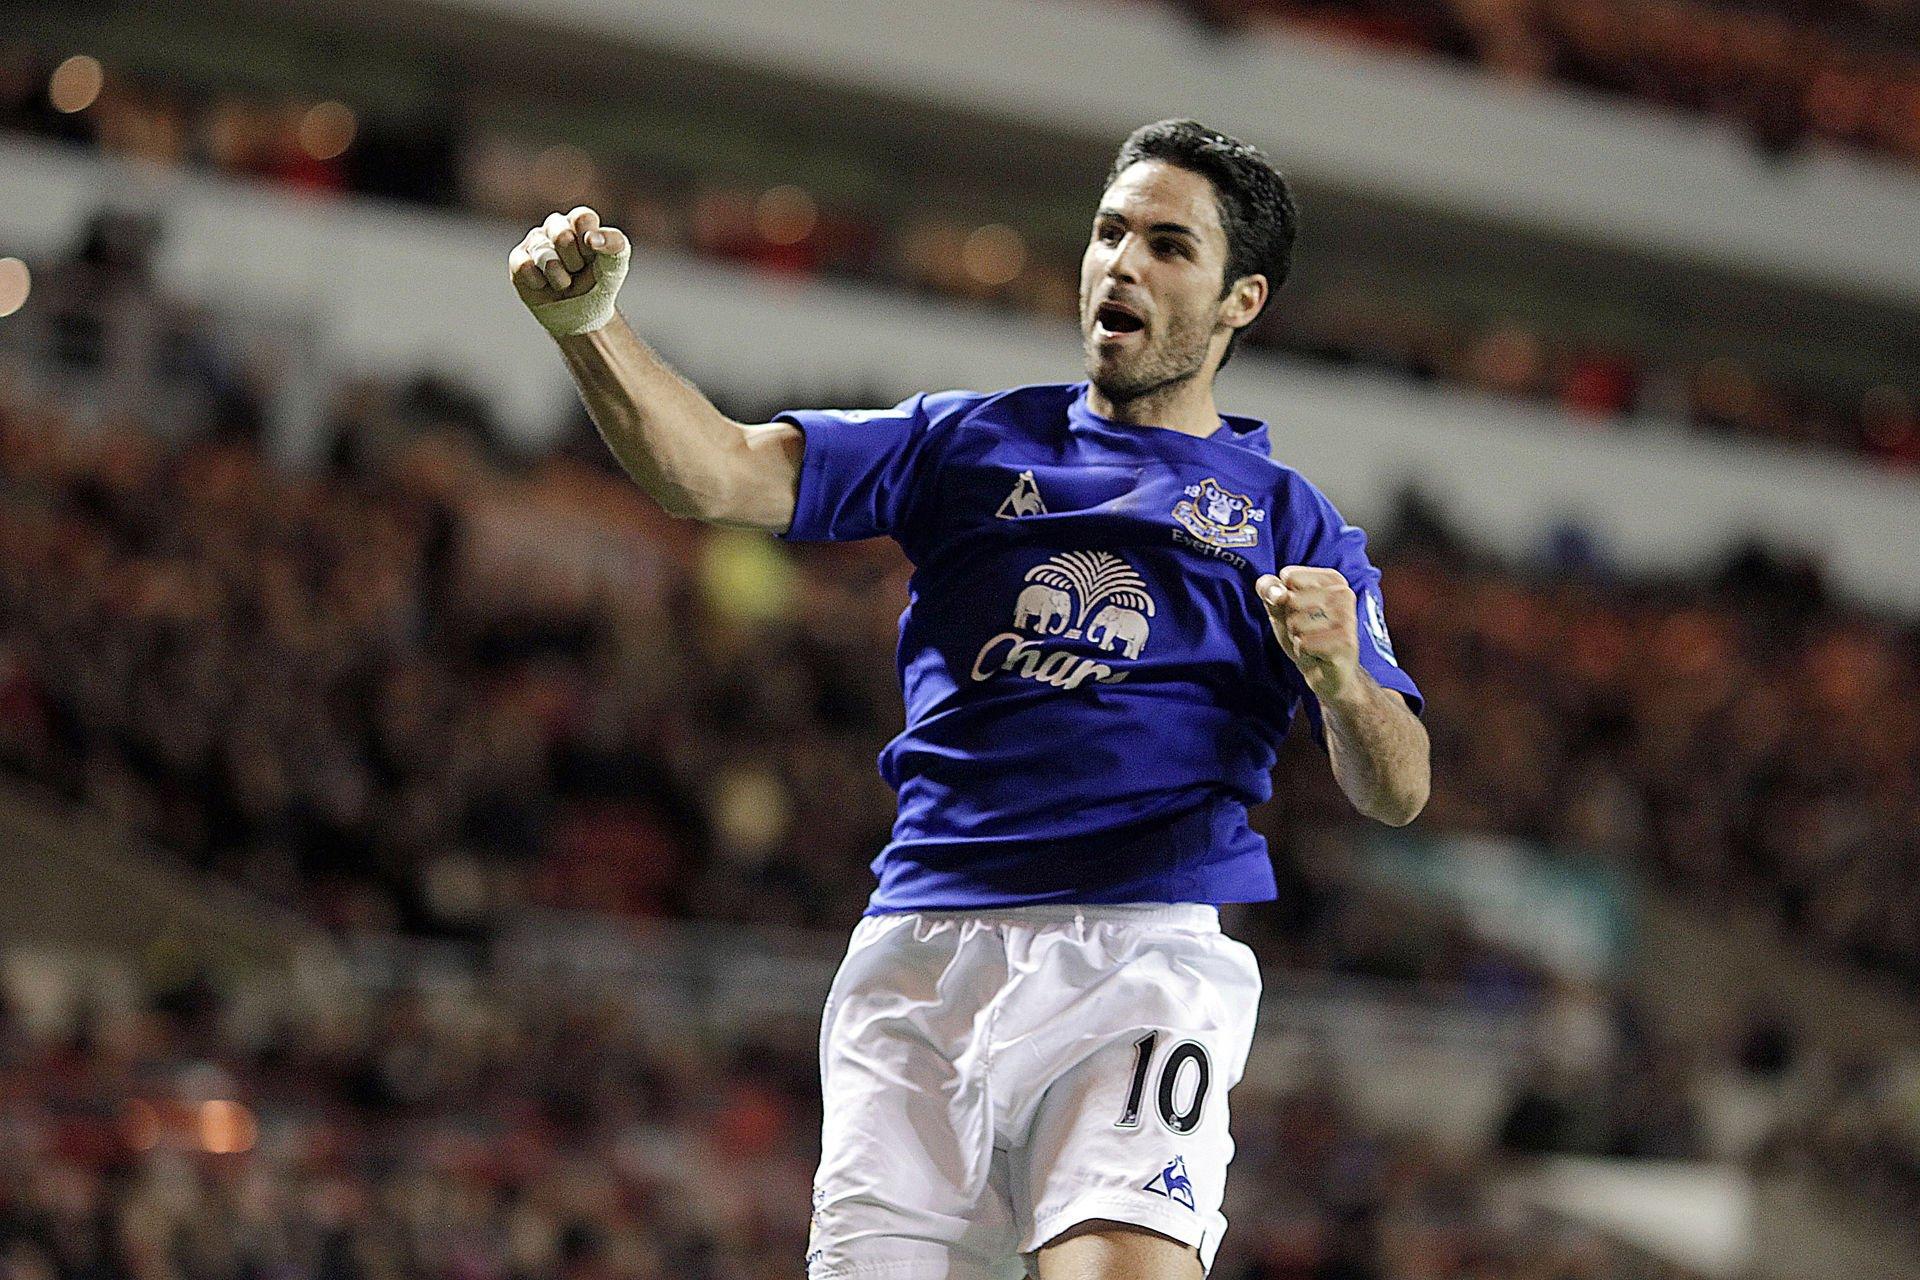 Everton fans want Mikel Arteta to replace Marco Silva